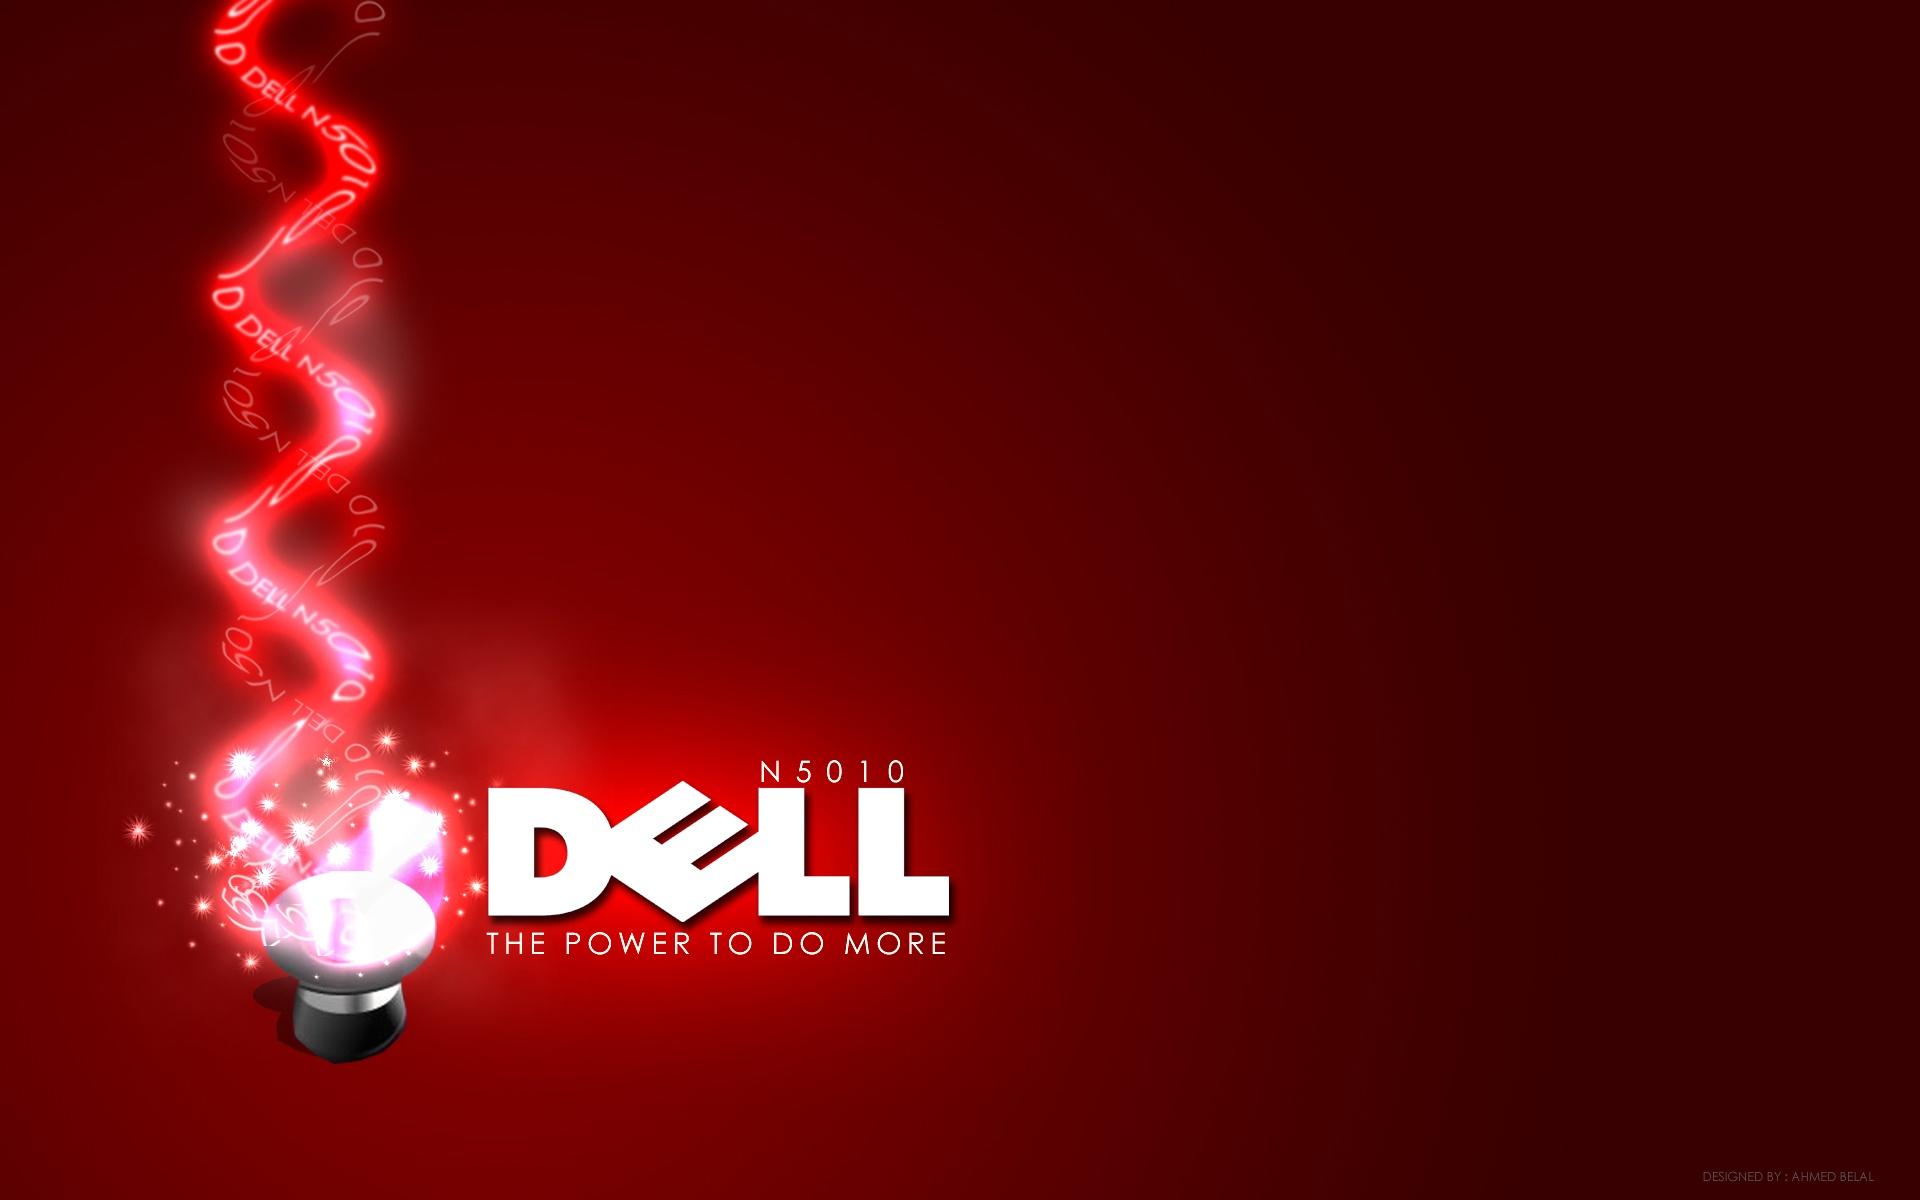 Dell Wallpaper1 写真と壁紙 写真と壁紙